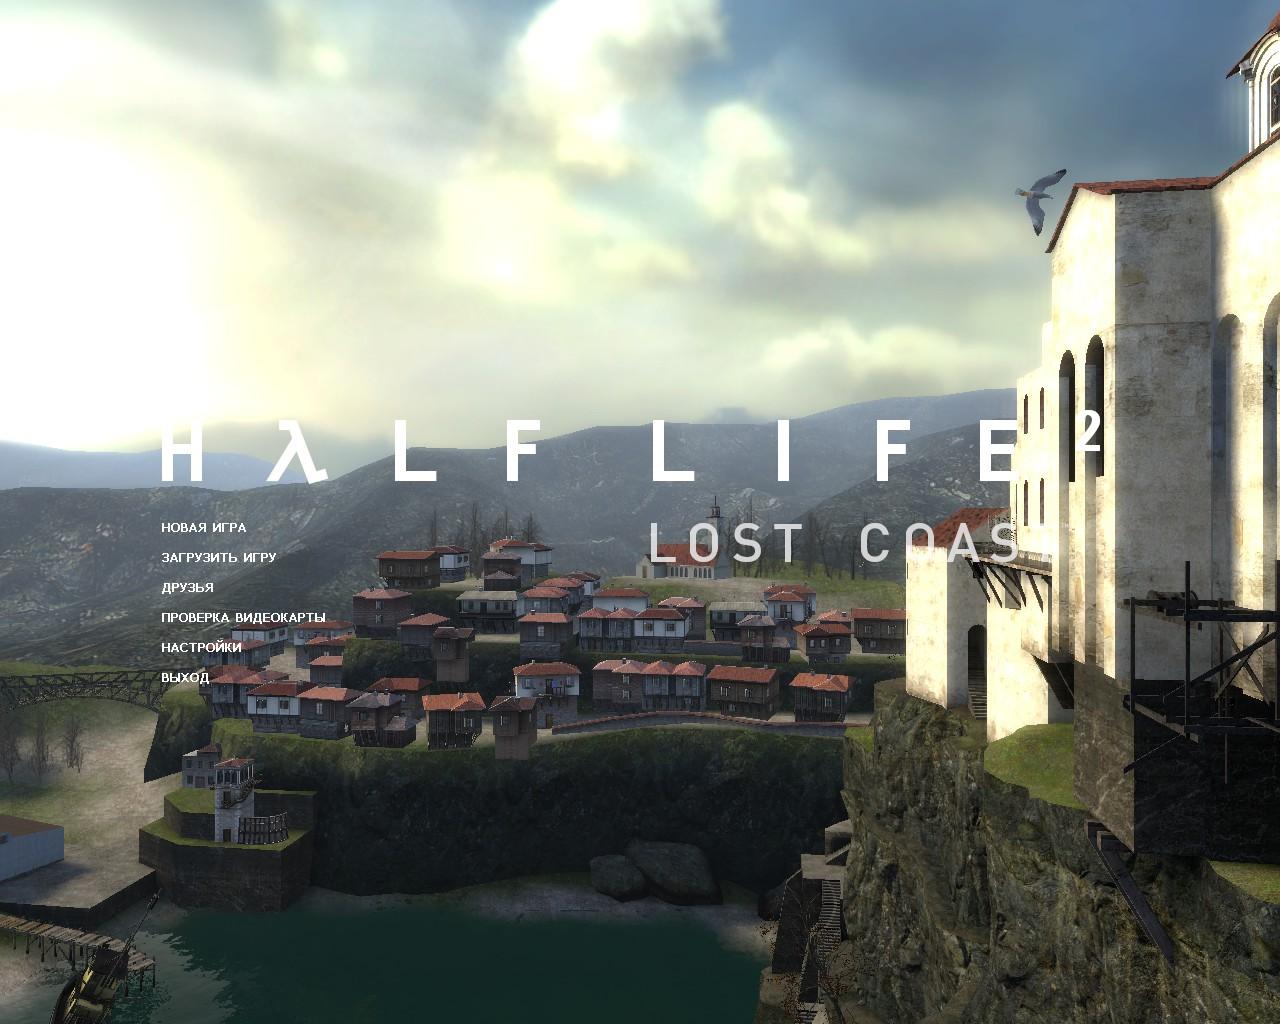 hl2 2013-11-30 22-40-58-61.jpg - Half-Life 2